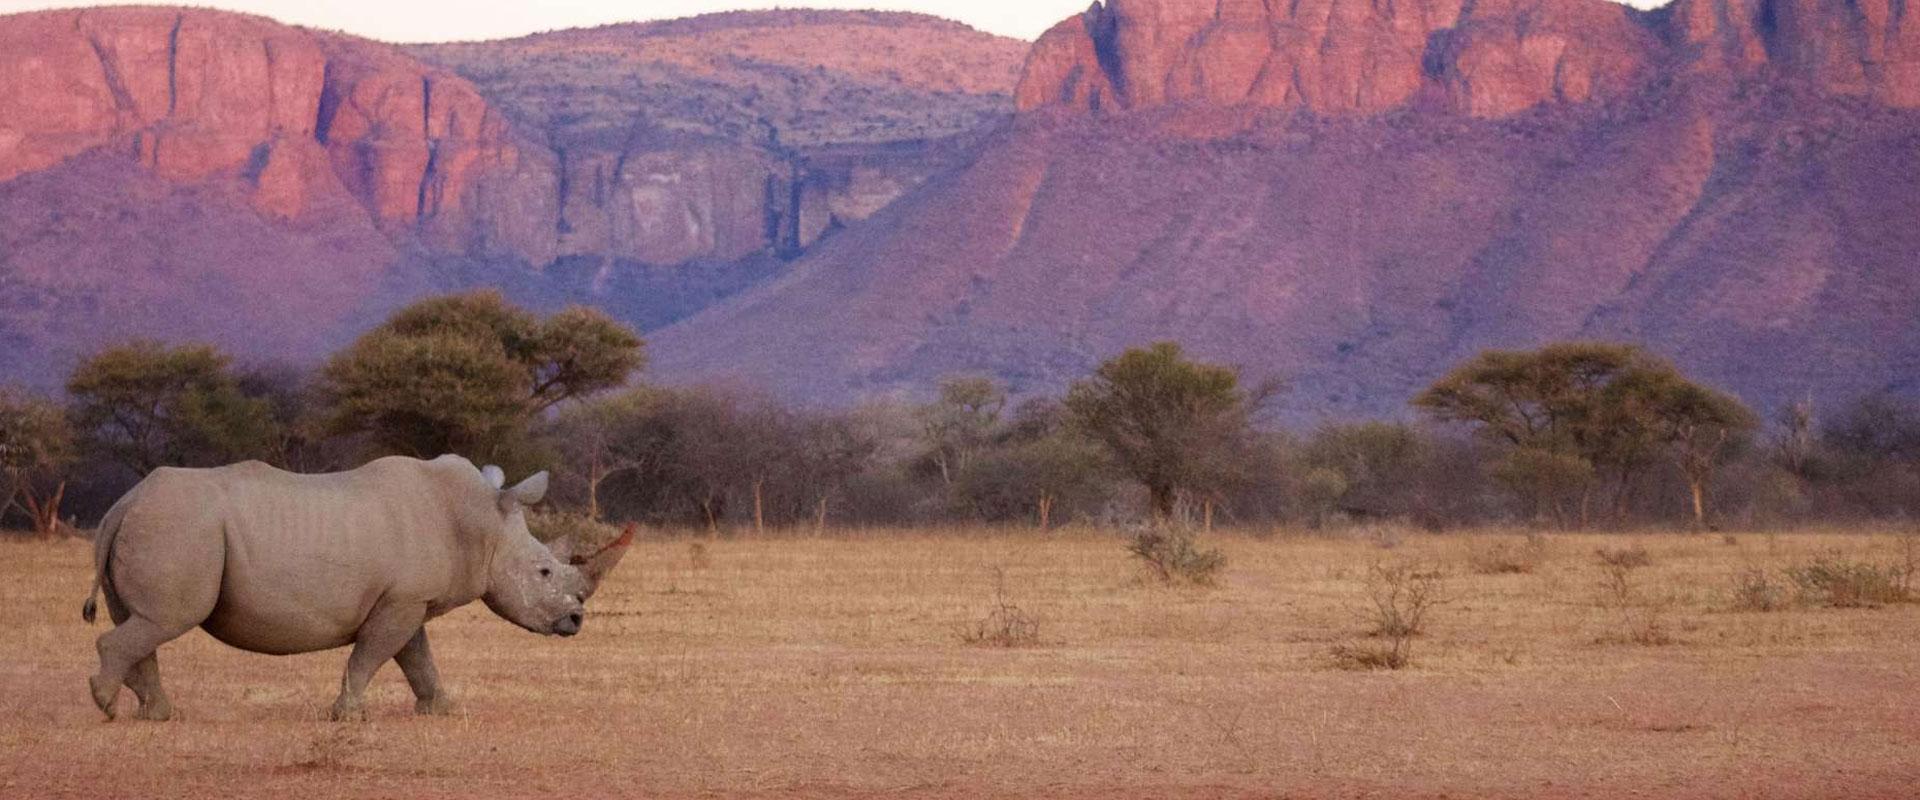 South-Africa-Safari